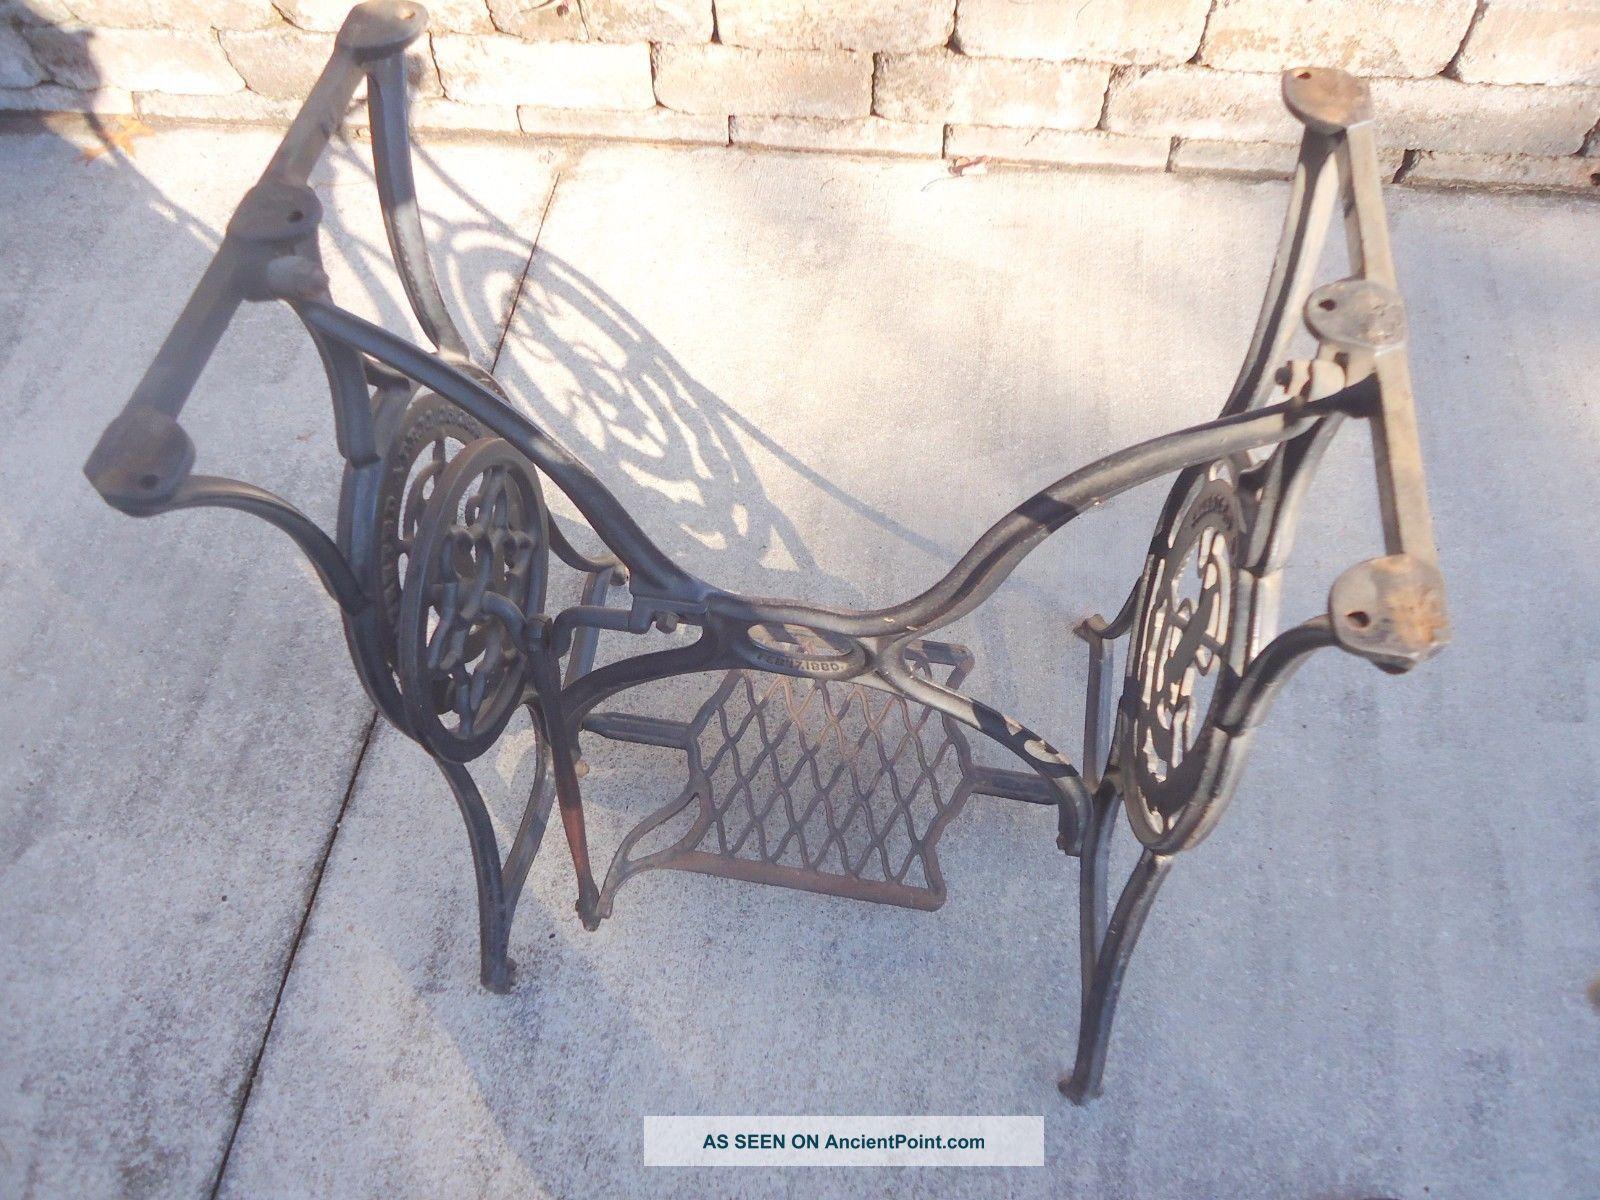 Antique Cast Iron Singer Treadle Sewing Machine Base 1880 Sewing Machines photo